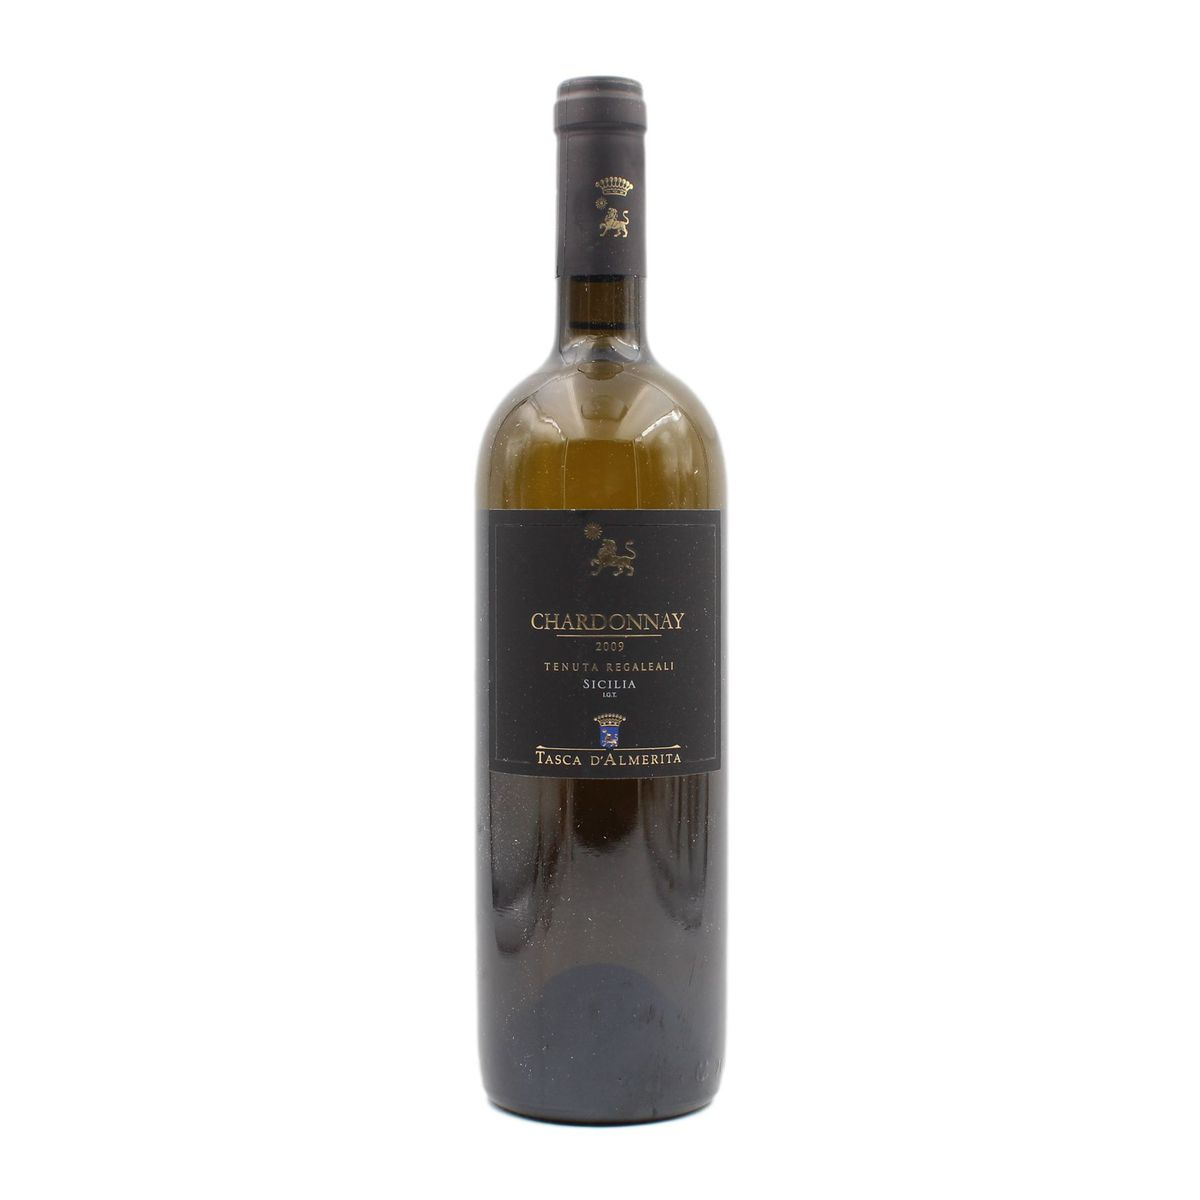 Chardonnay 2009 Tasca D'Almerita